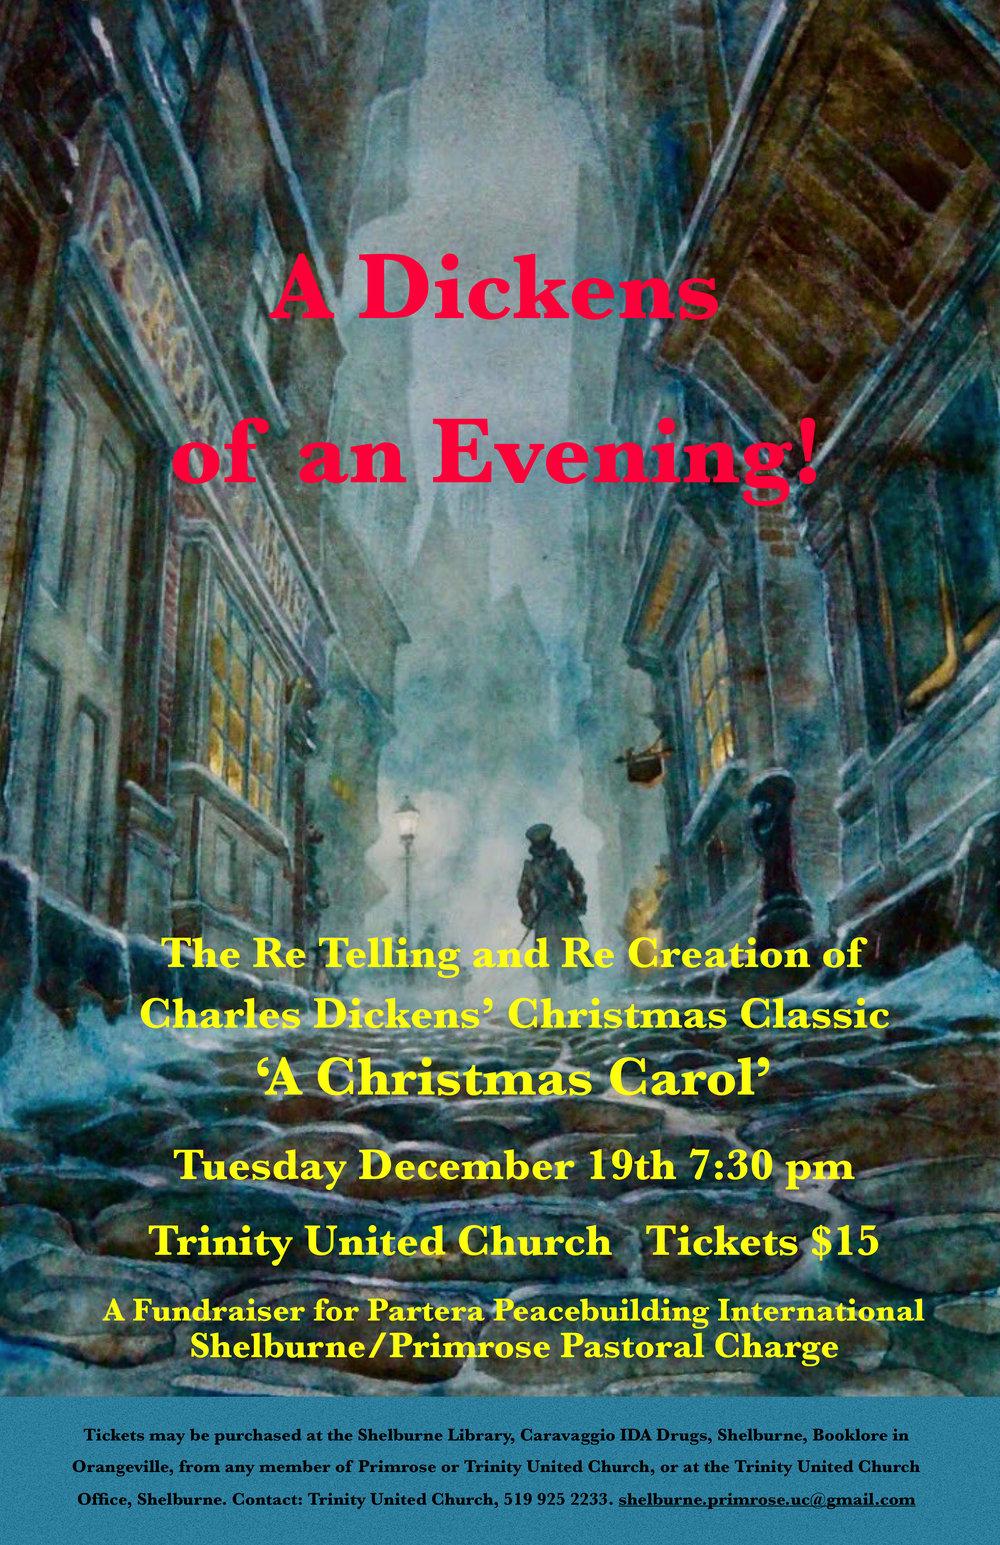 Poster A Dickens Evening Tabloid Print_0001.jpg